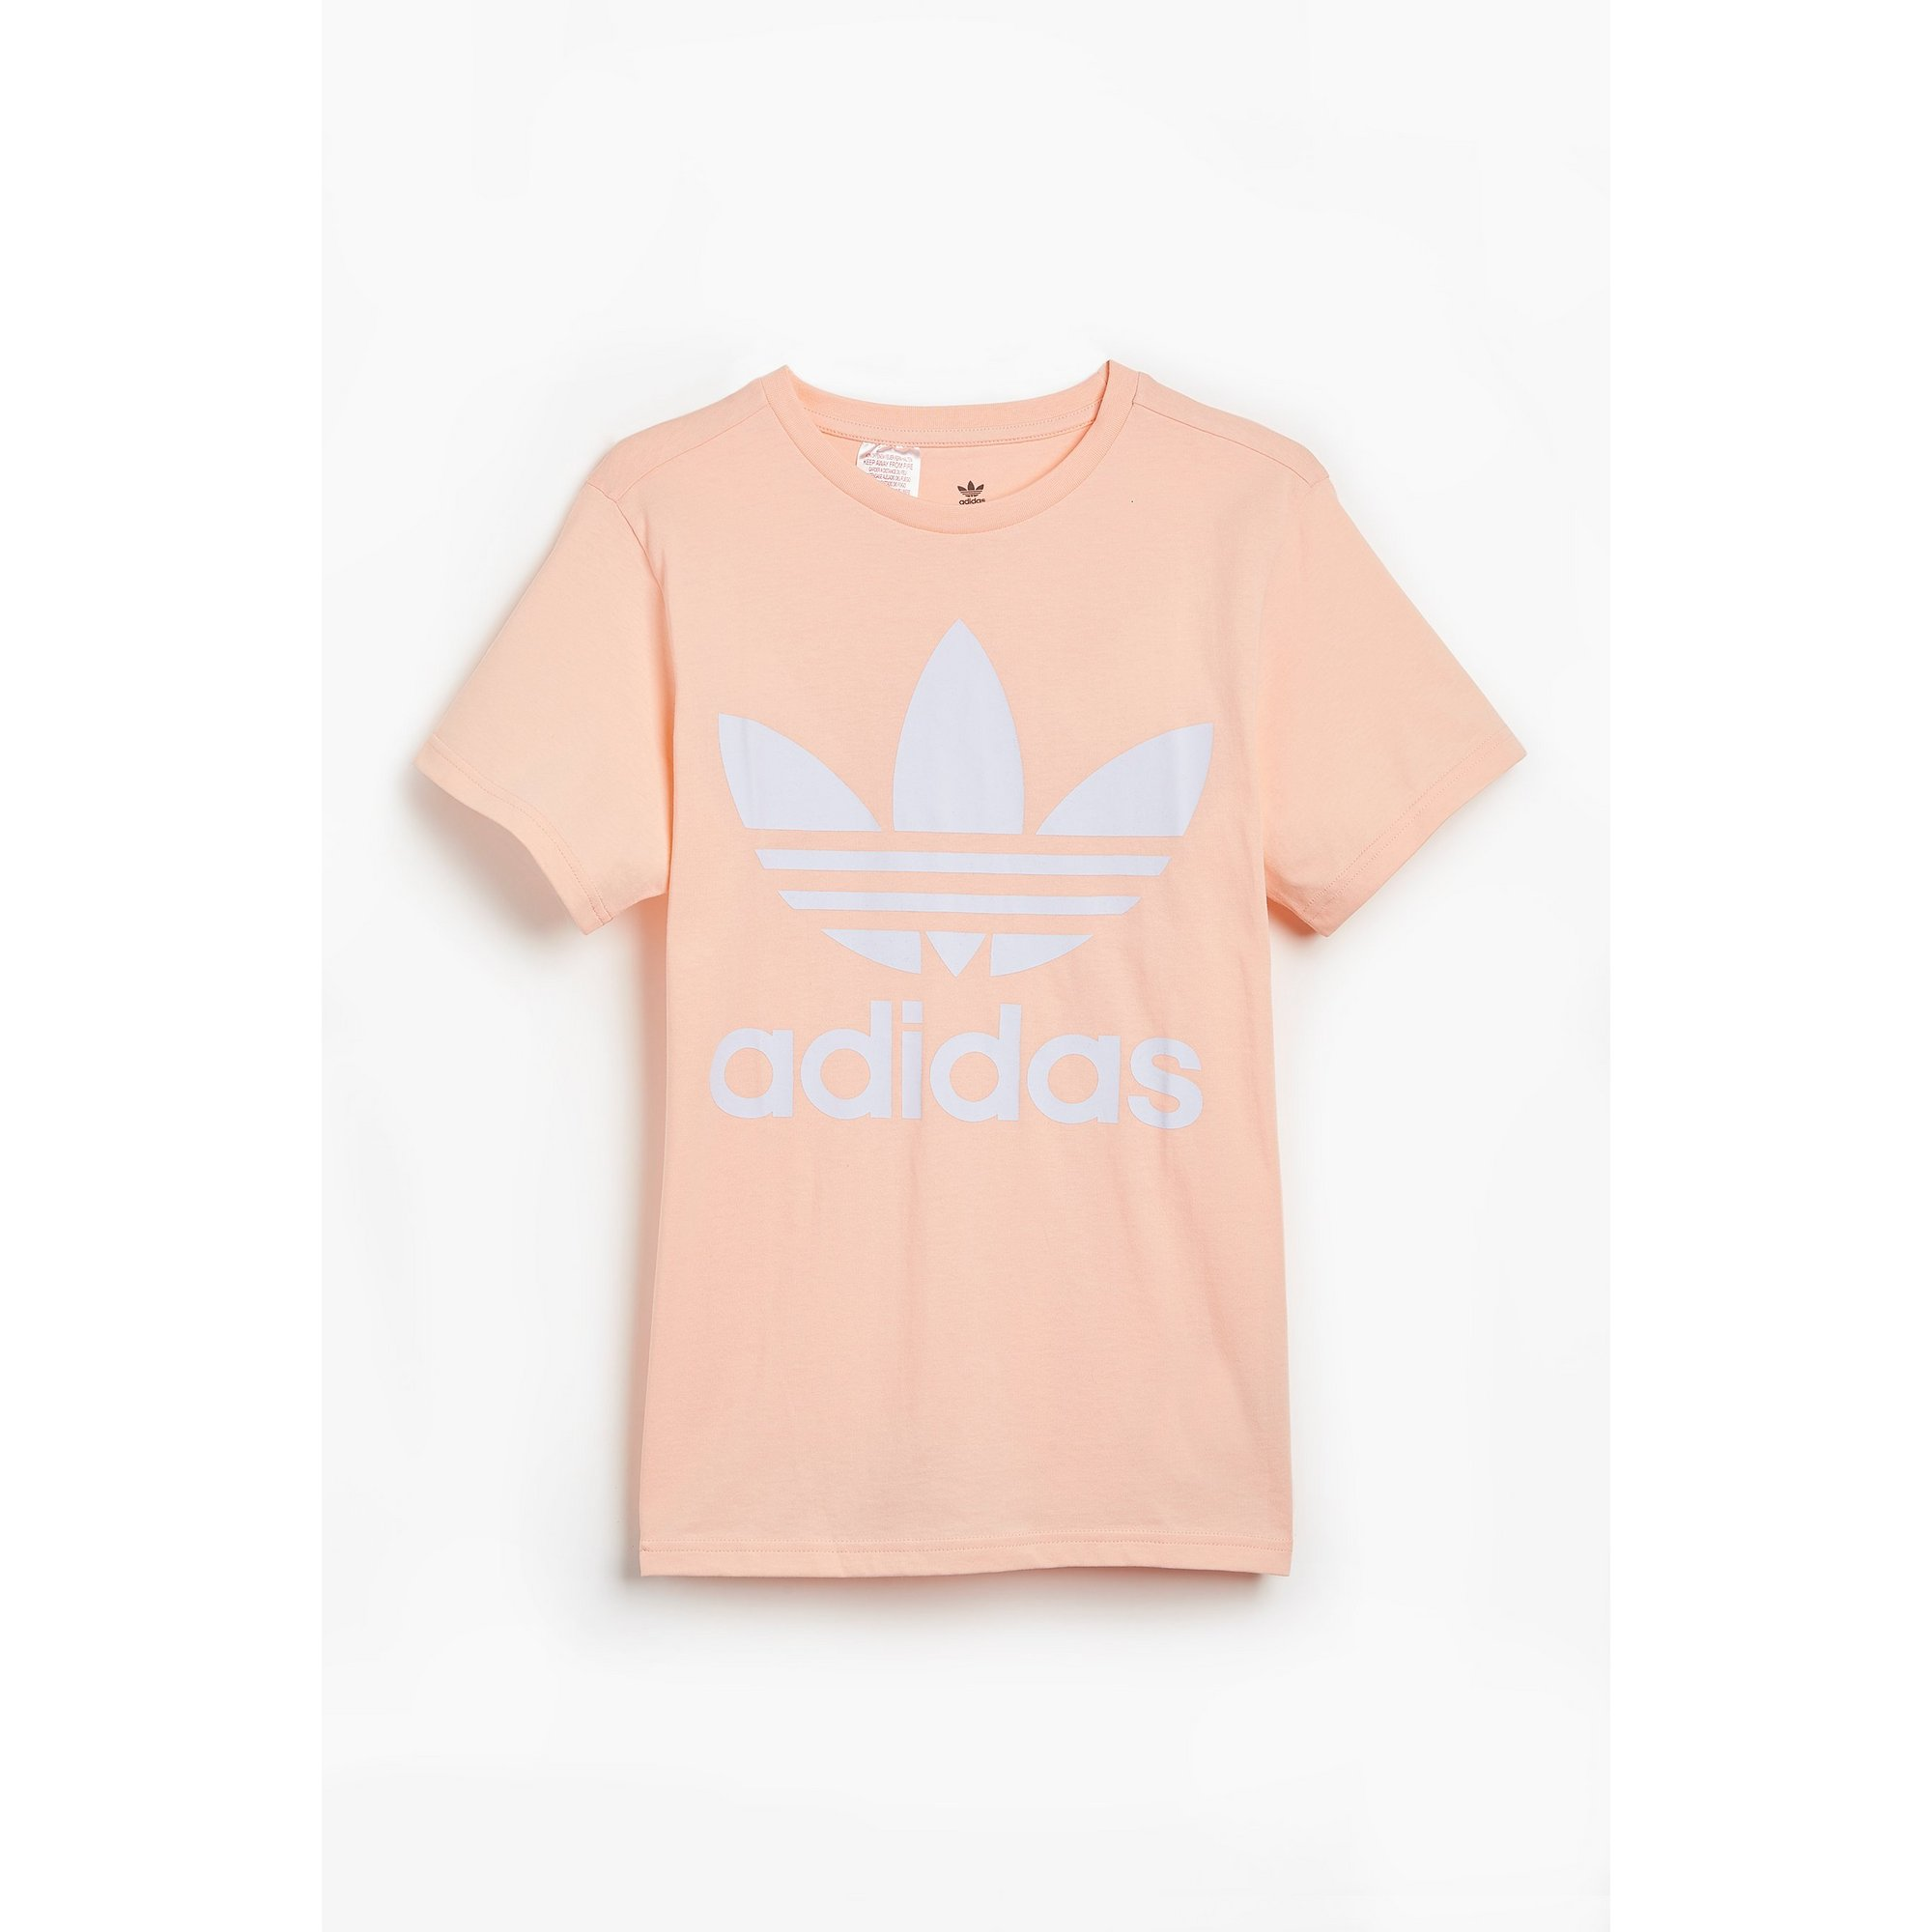 Image of Girls adidas Trefoil Haze Coral T-Shirt